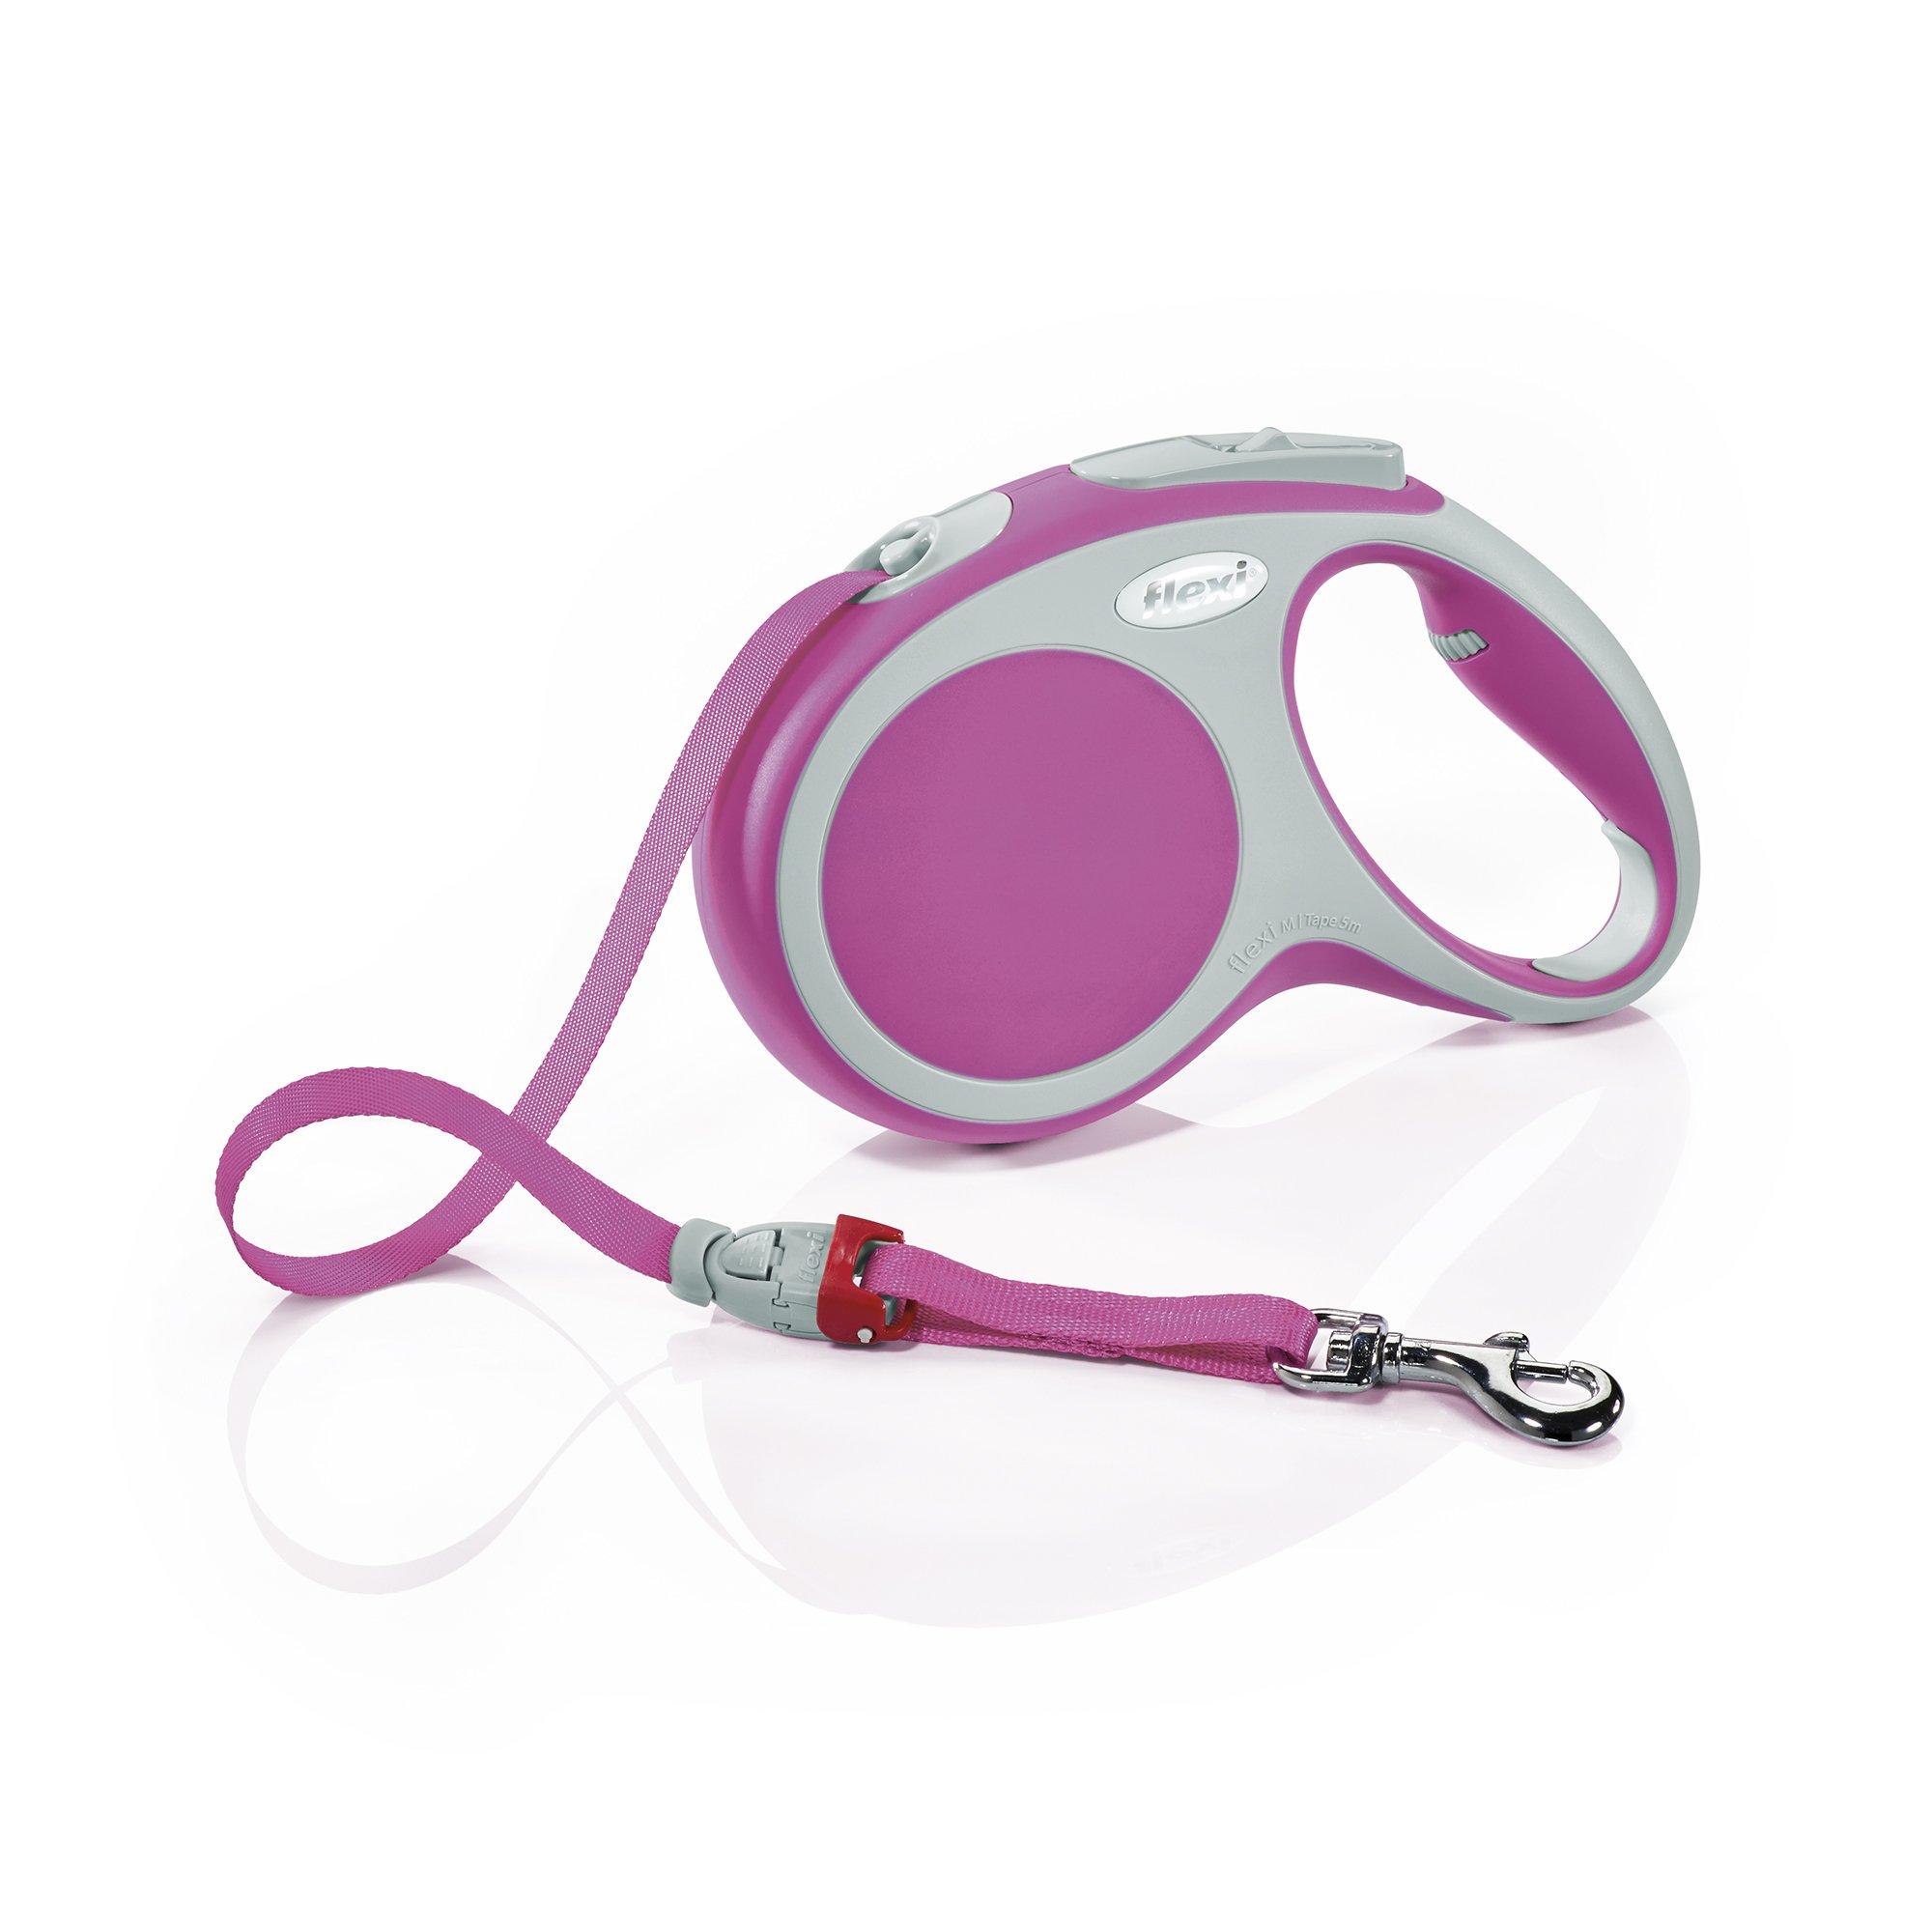 Flexi Vario Retractable Dog Leash (Tape), 16 ft, Medium, Pink